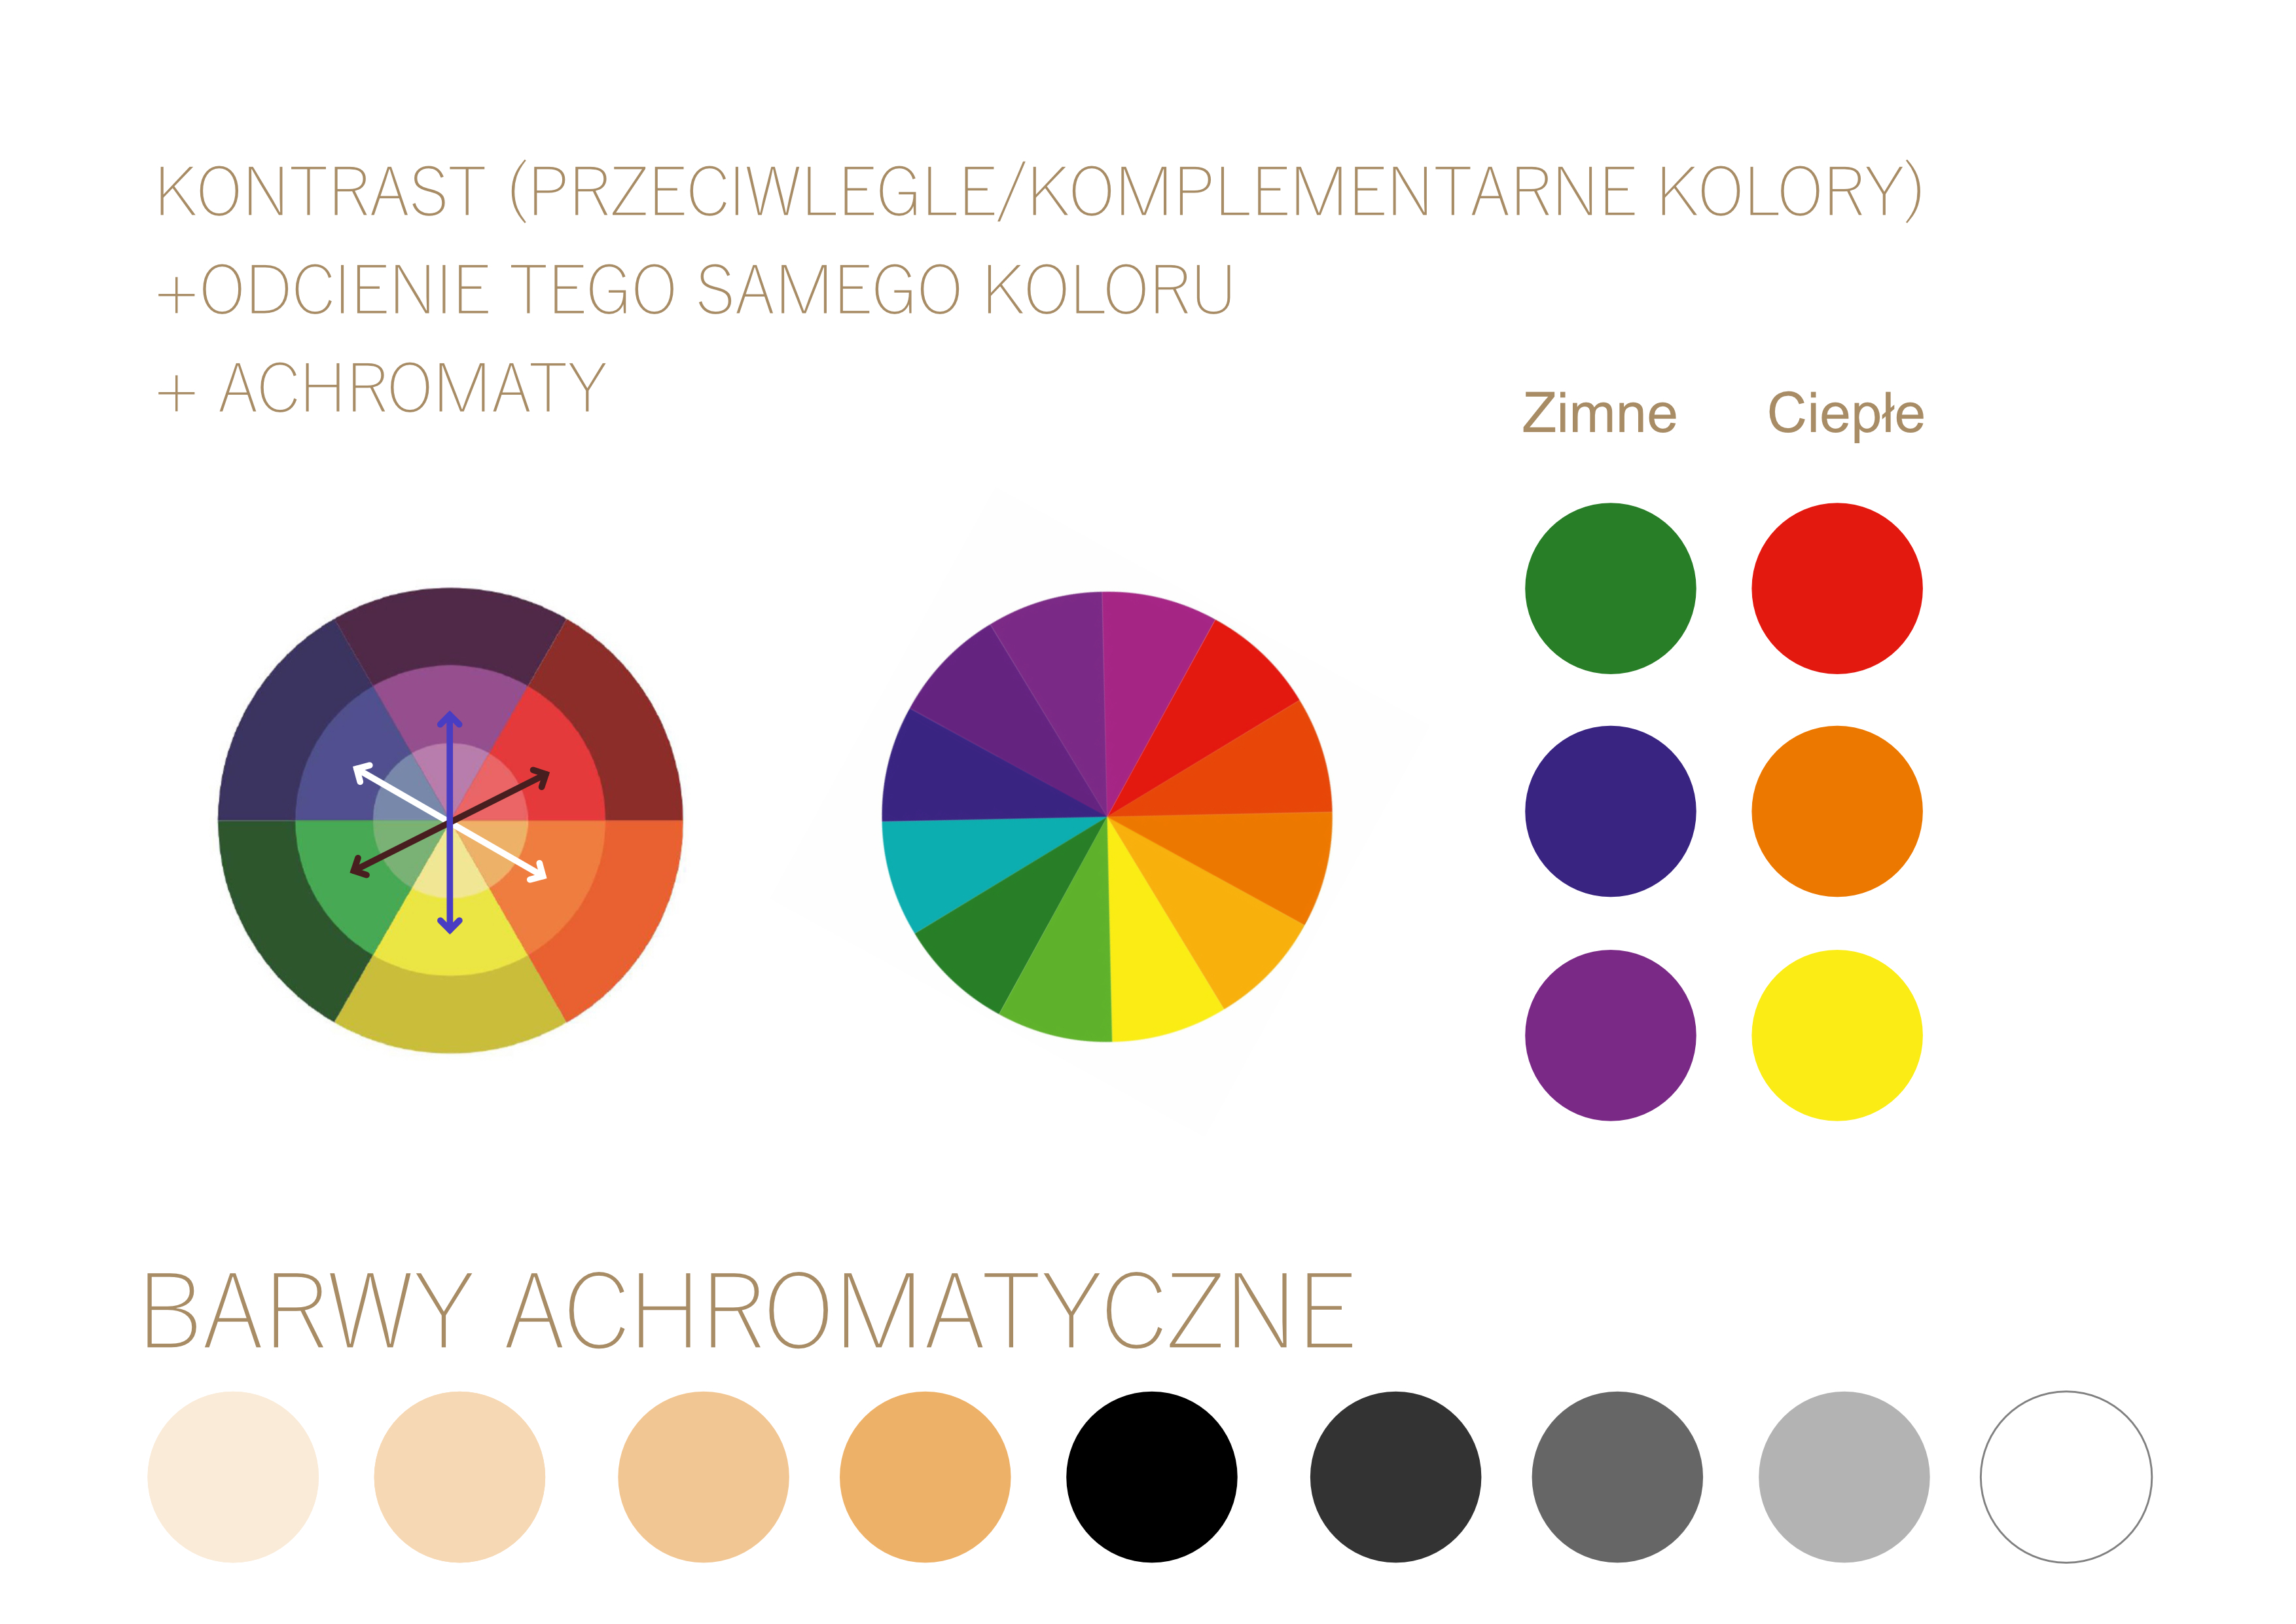 barwy kontrastowe przeciwlegle komplementarne